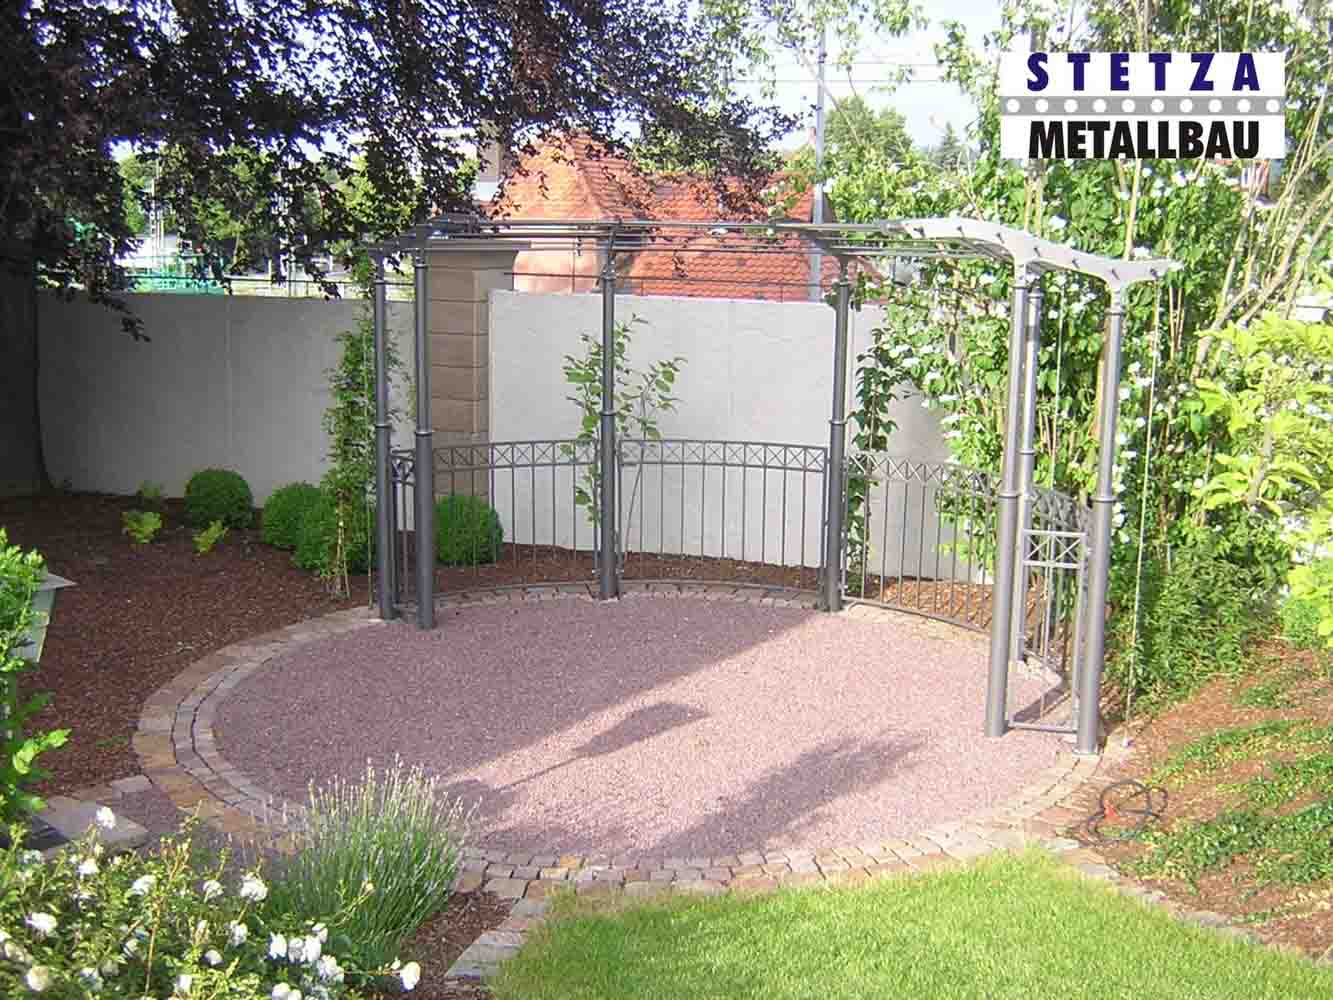 Gartengestaltung 0005 stetza metallbau de for Gartengestaltung 2016